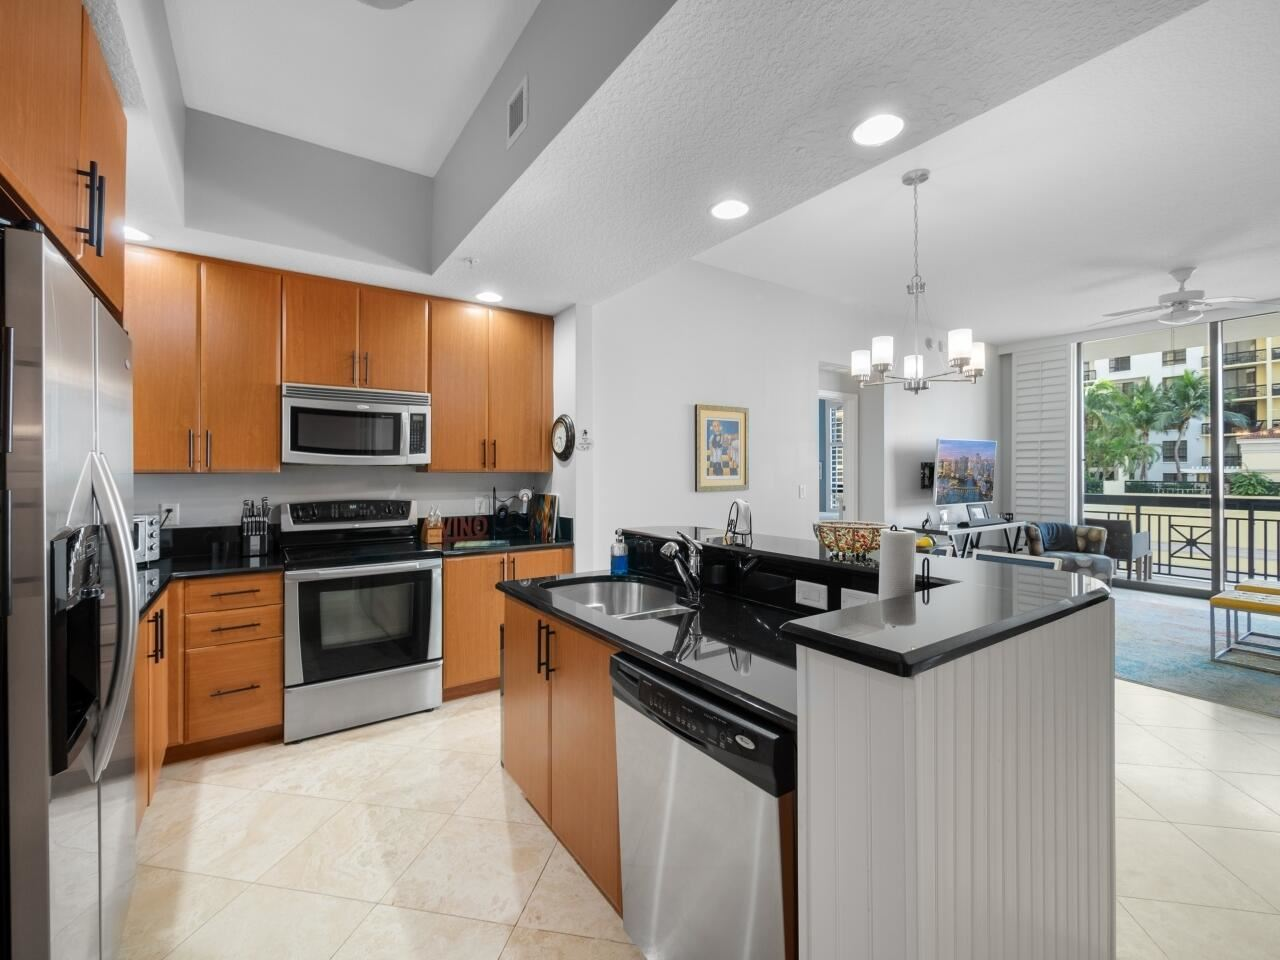 701 S Olive 602 Avenue #602, West Palm Beach, FL 33401 - MLS#: RX-10751894